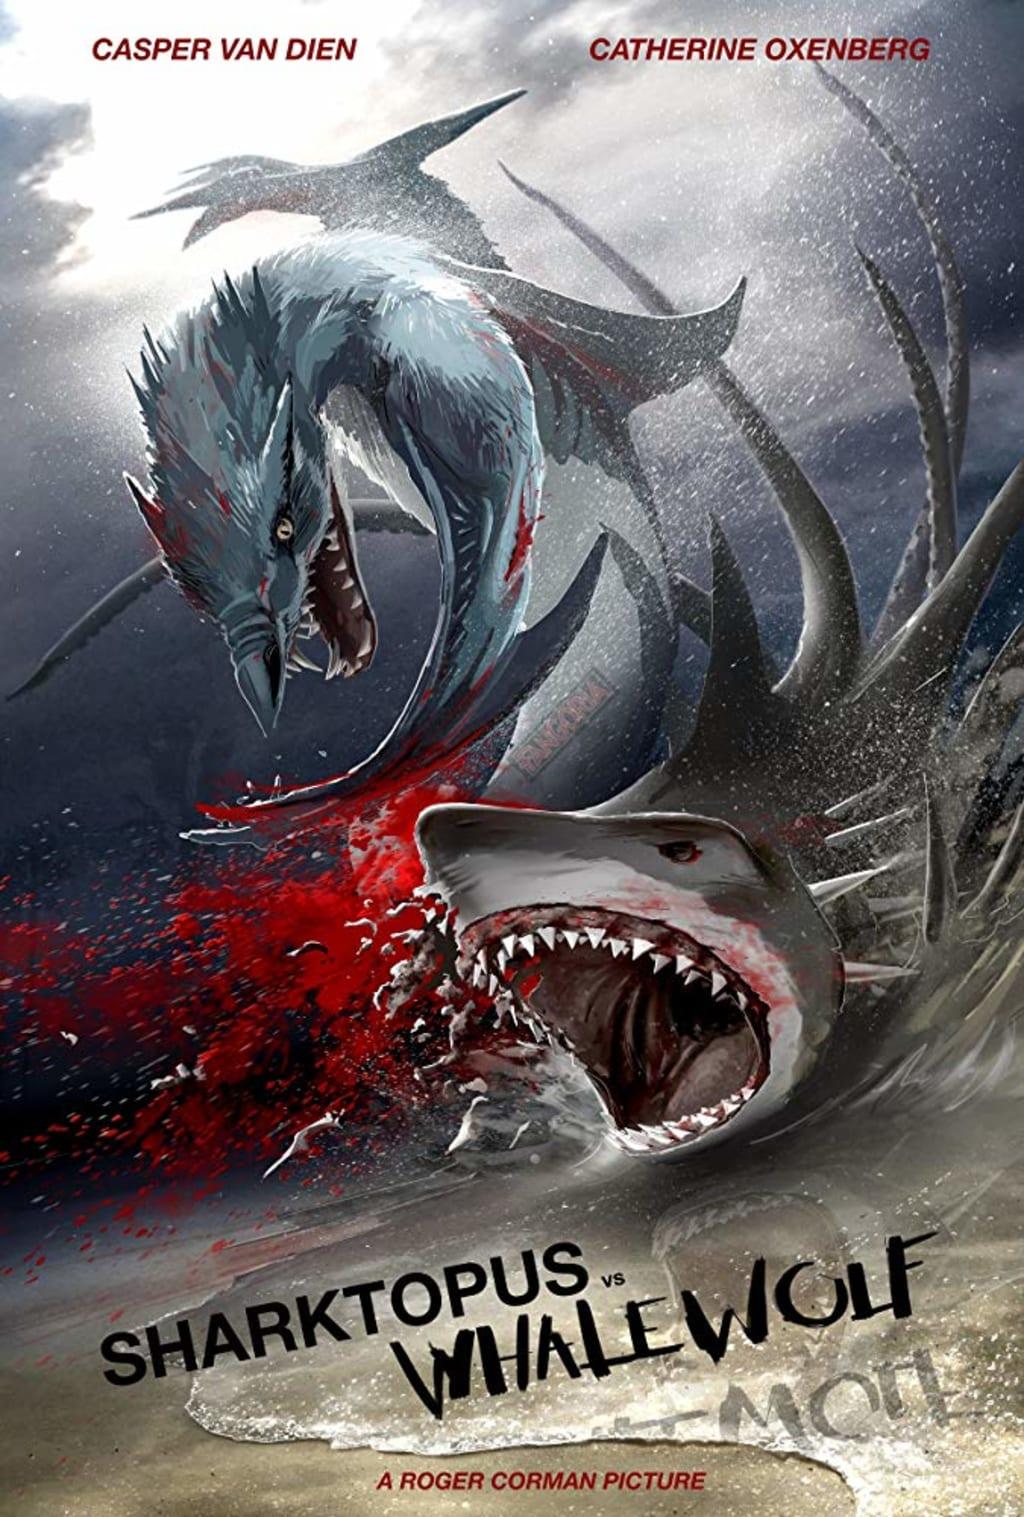 Reed Alexander's Horror Review of 'Sharktopus vs. Whalewolf' (2015)